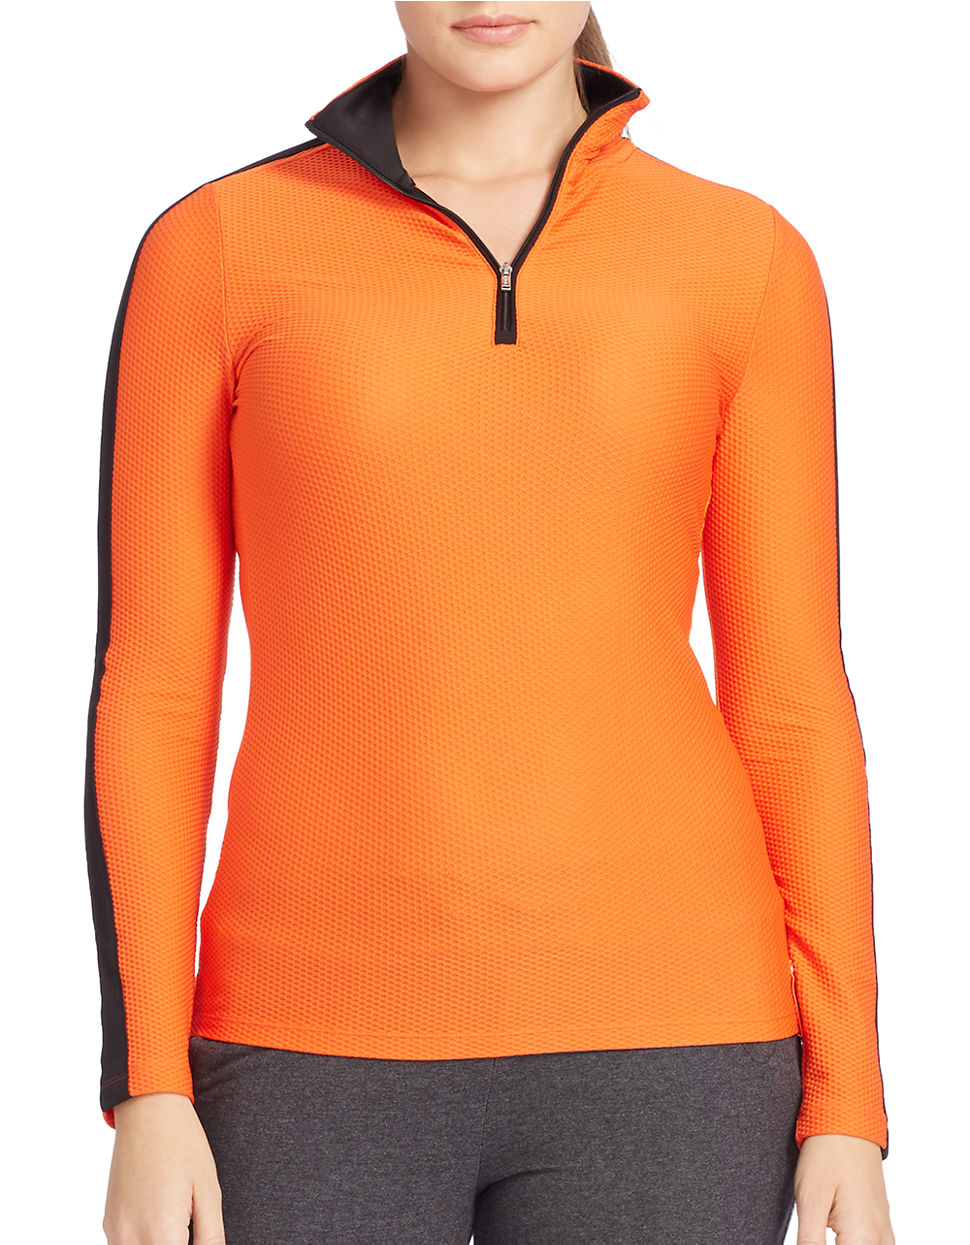 lauren by ralph lauren plus stretch mesh pullover in orange lyst. Black Bedroom Furniture Sets. Home Design Ideas